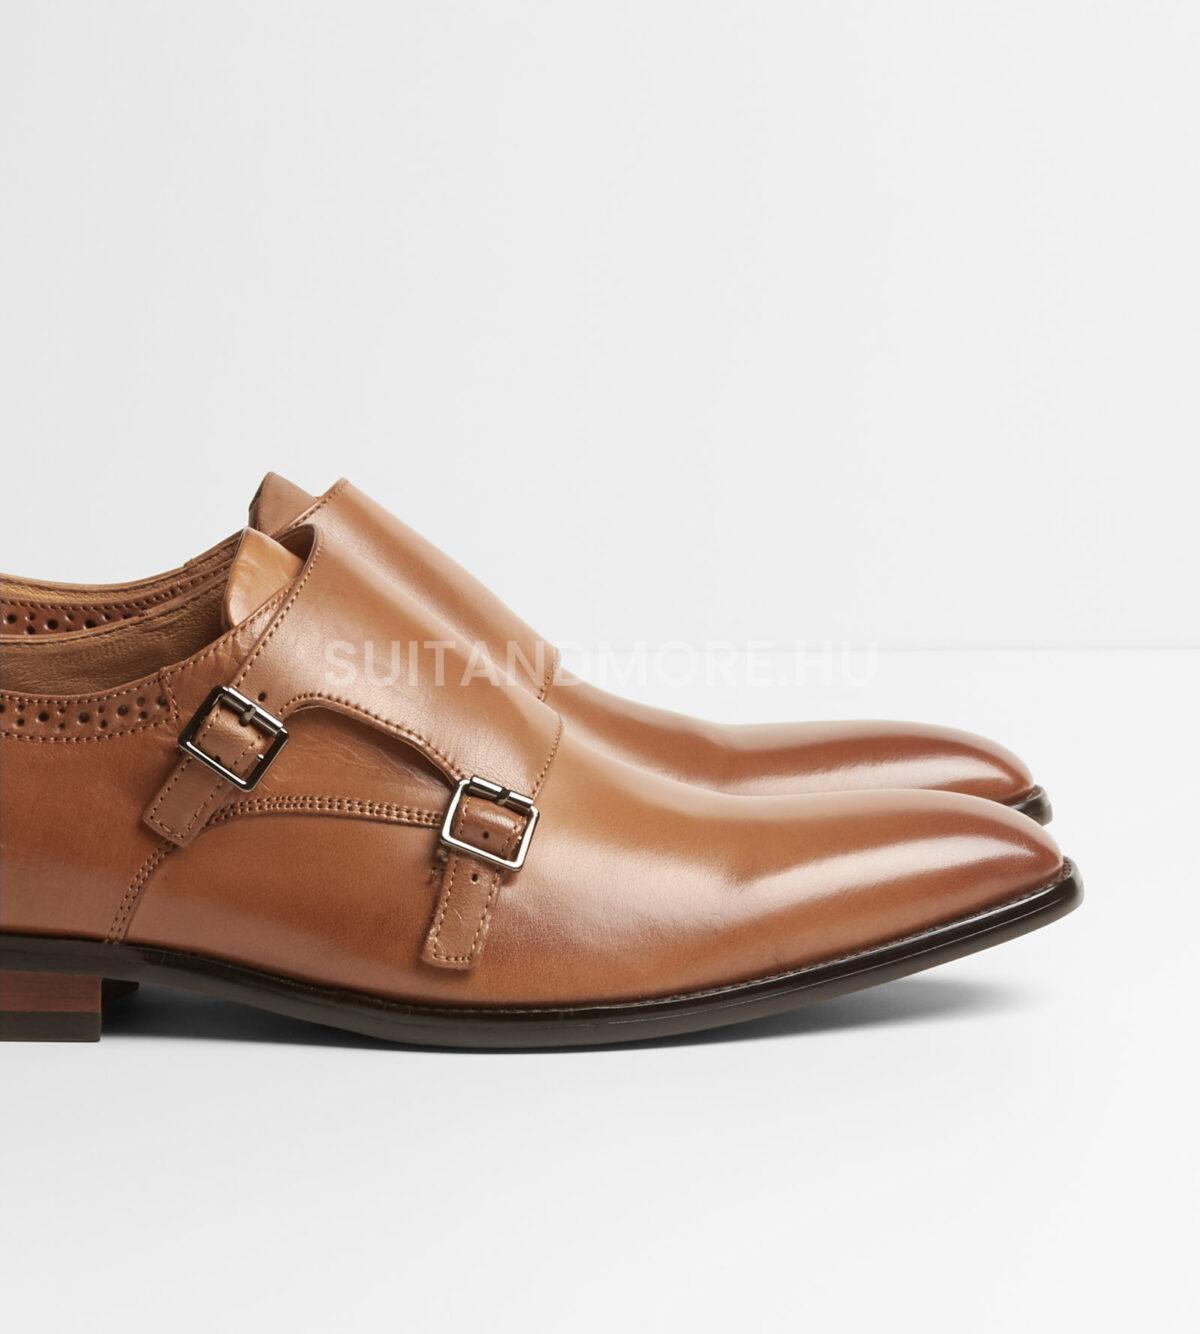 DIGEL-barna-dupla-csatos-elegáns-cipő-SALOMON-1001908-35-03